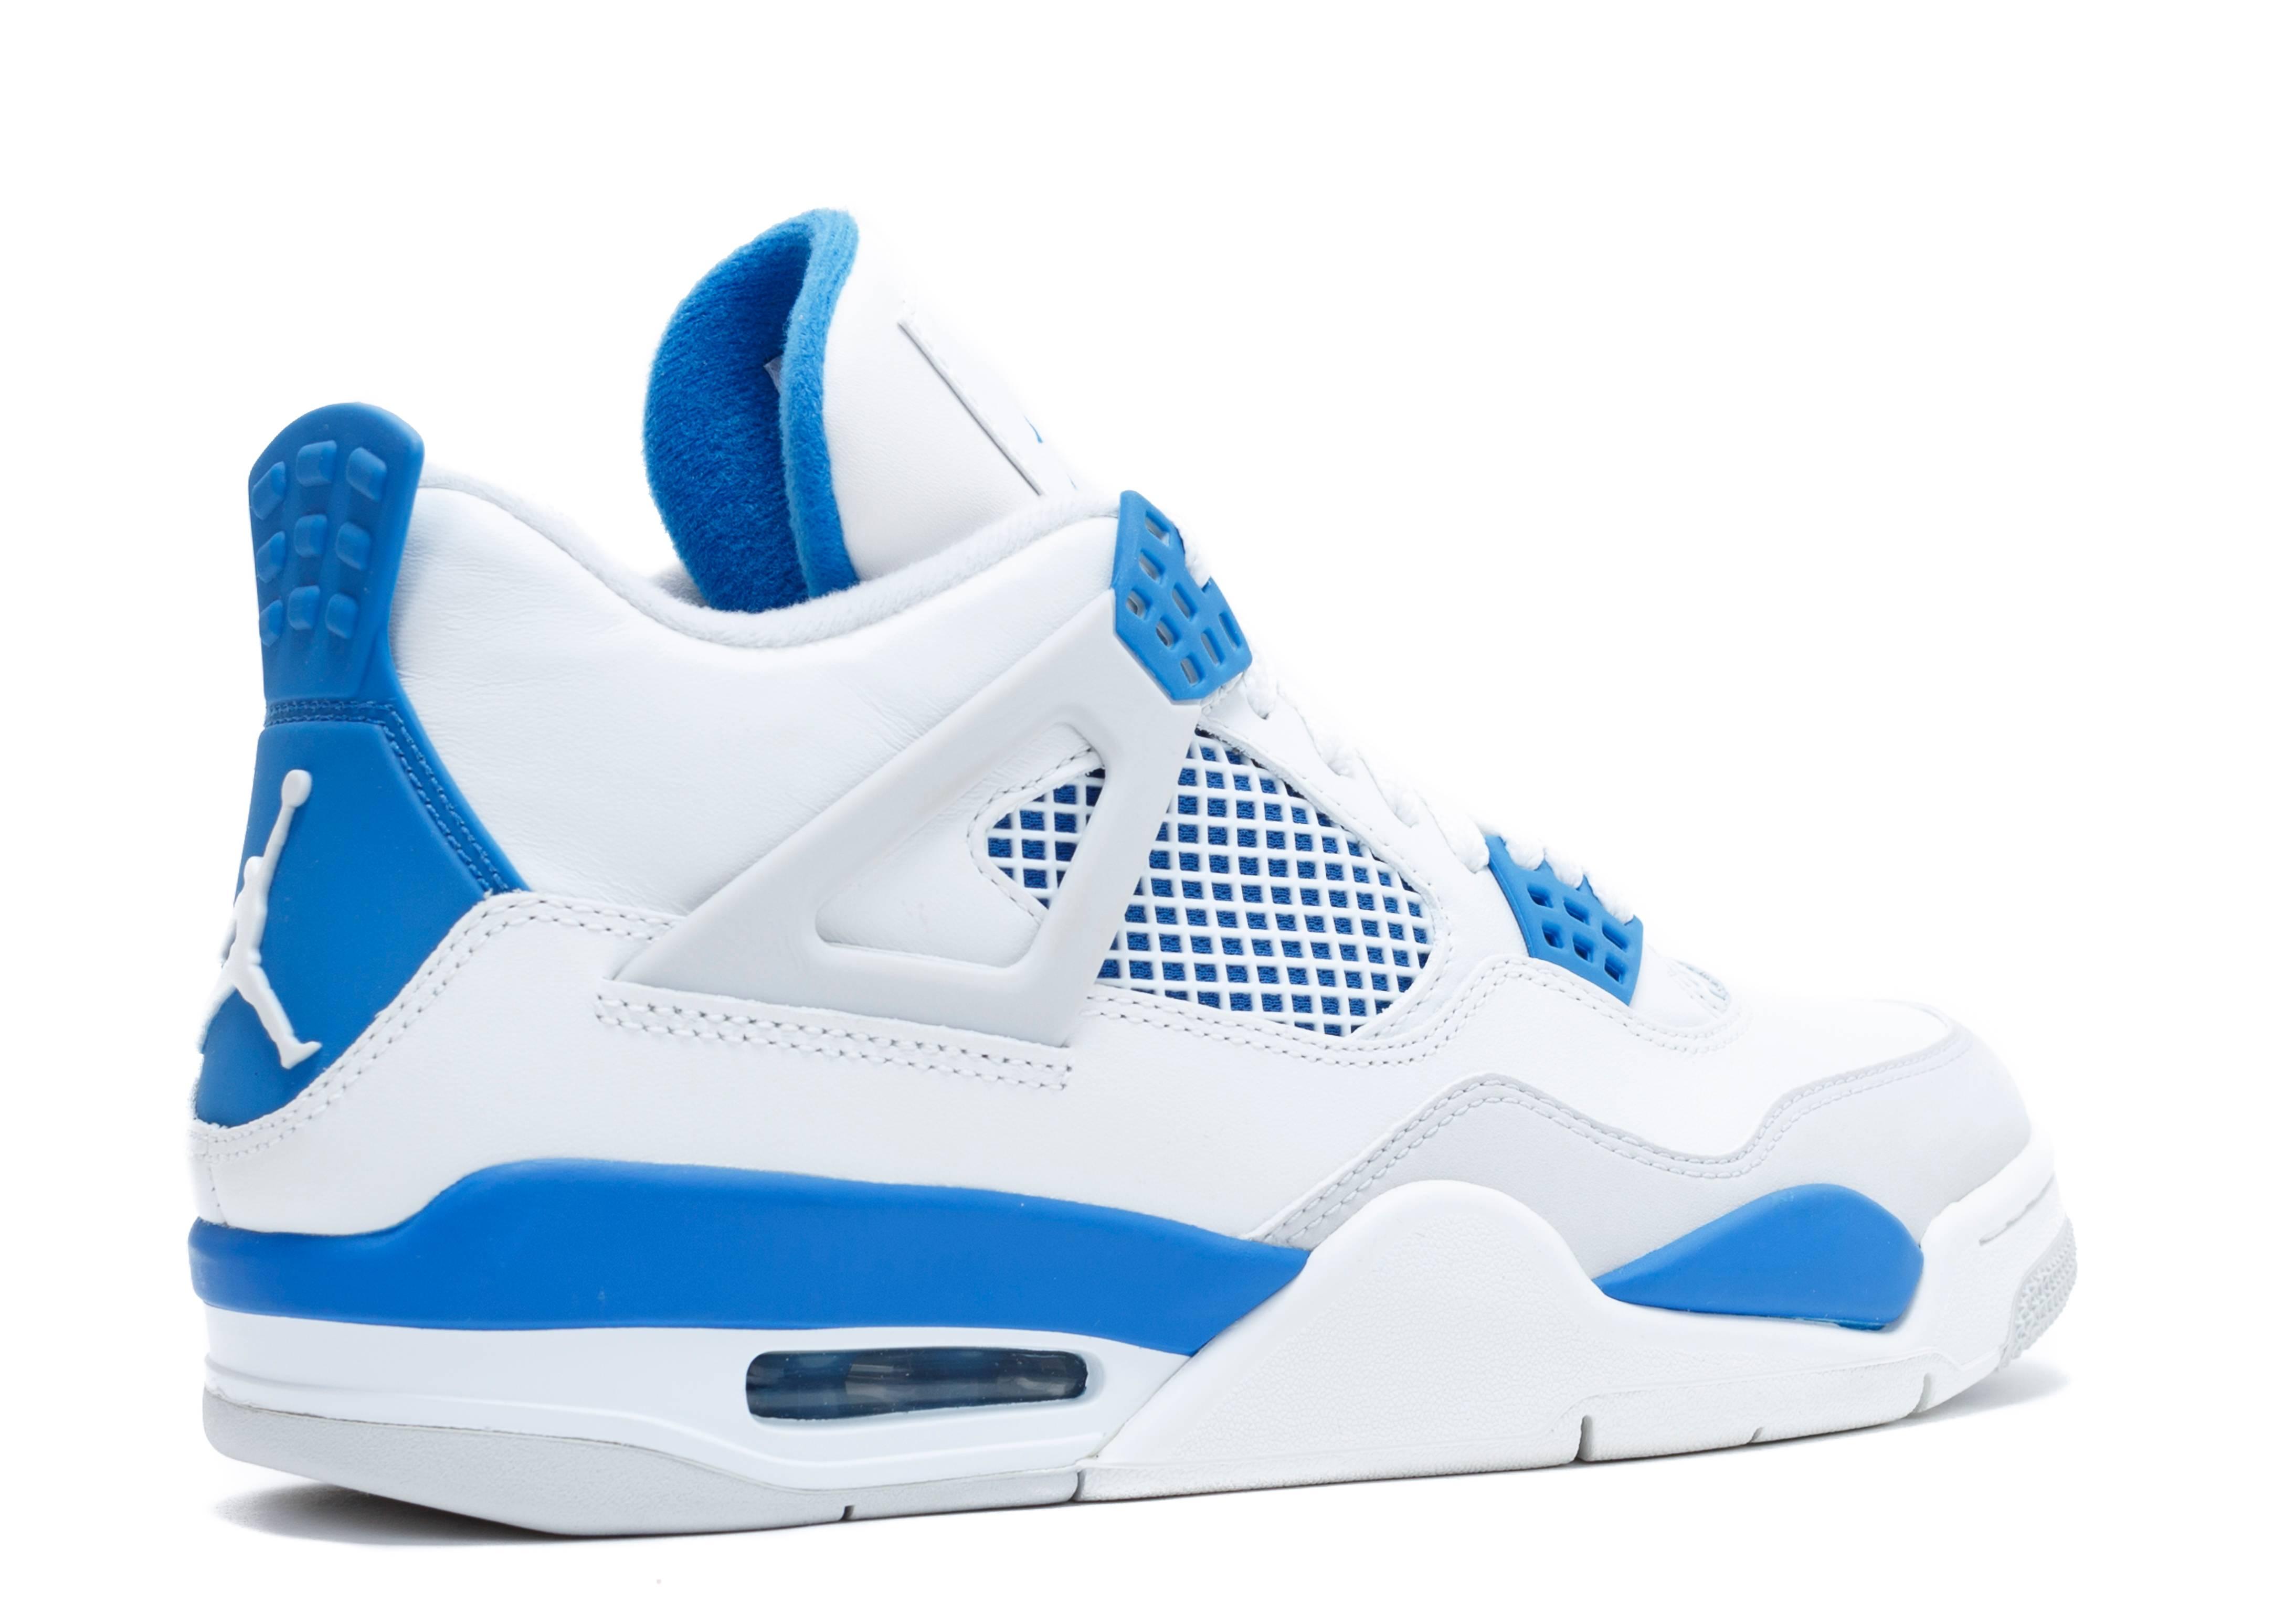 Air Jordan 4 Kopen